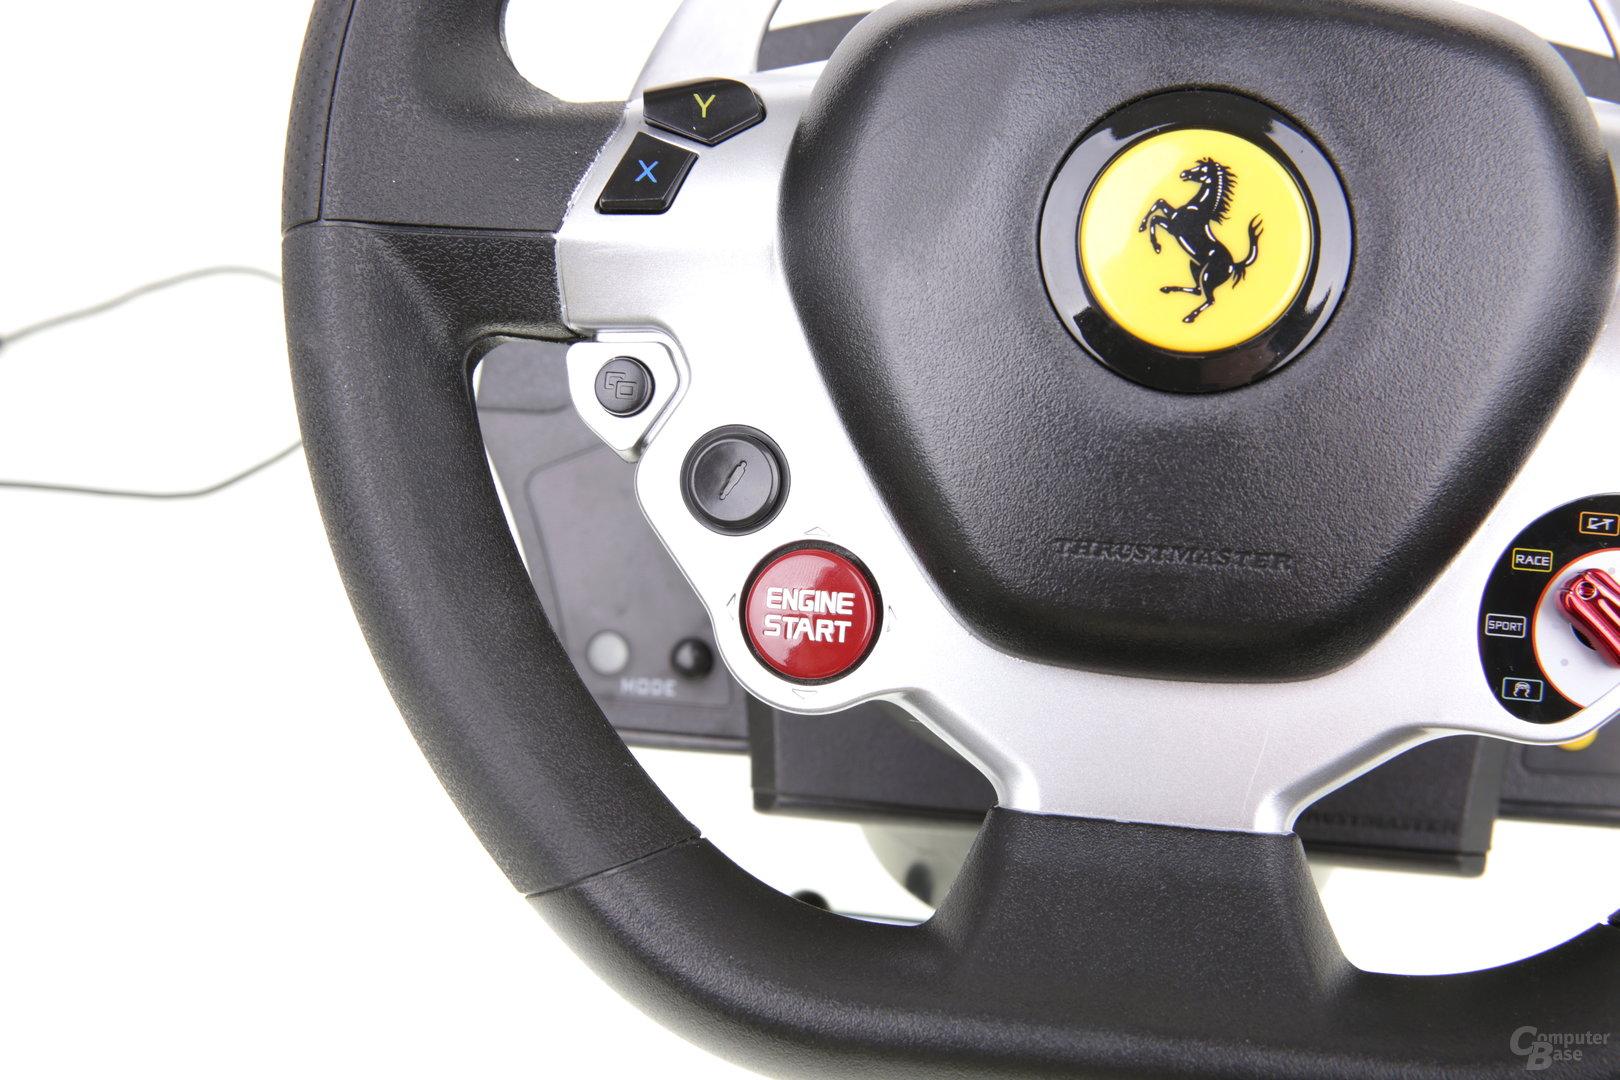 Thrustmaster TX Ferrari 458 - Joystick-Start-Knopf